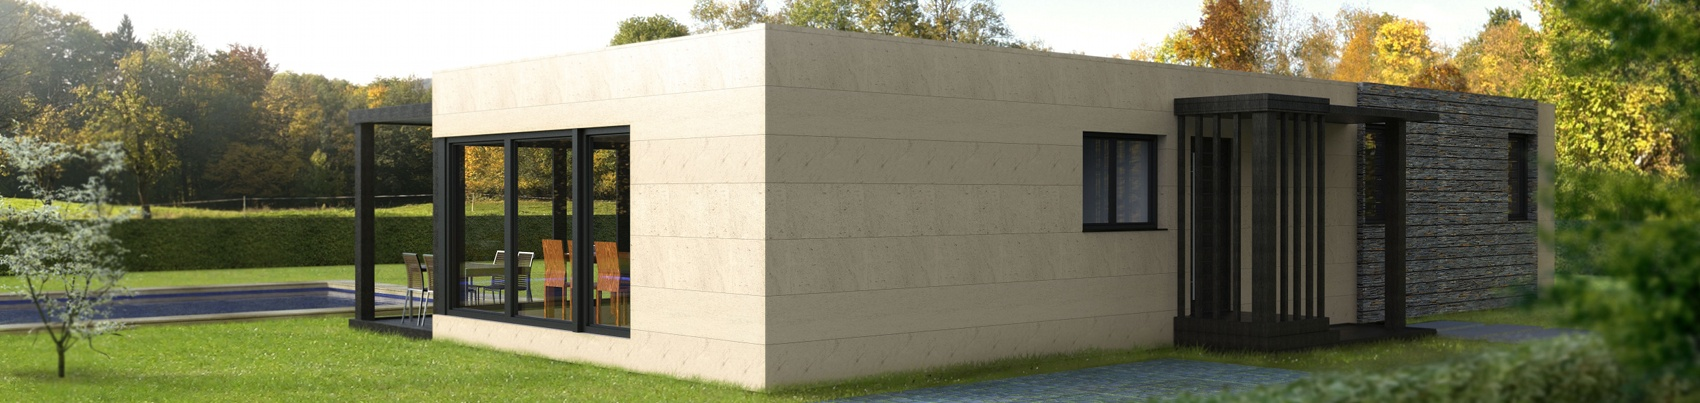 Cube 150 casas prefabricadas y modulares cube - Casa modular prefabricada ...